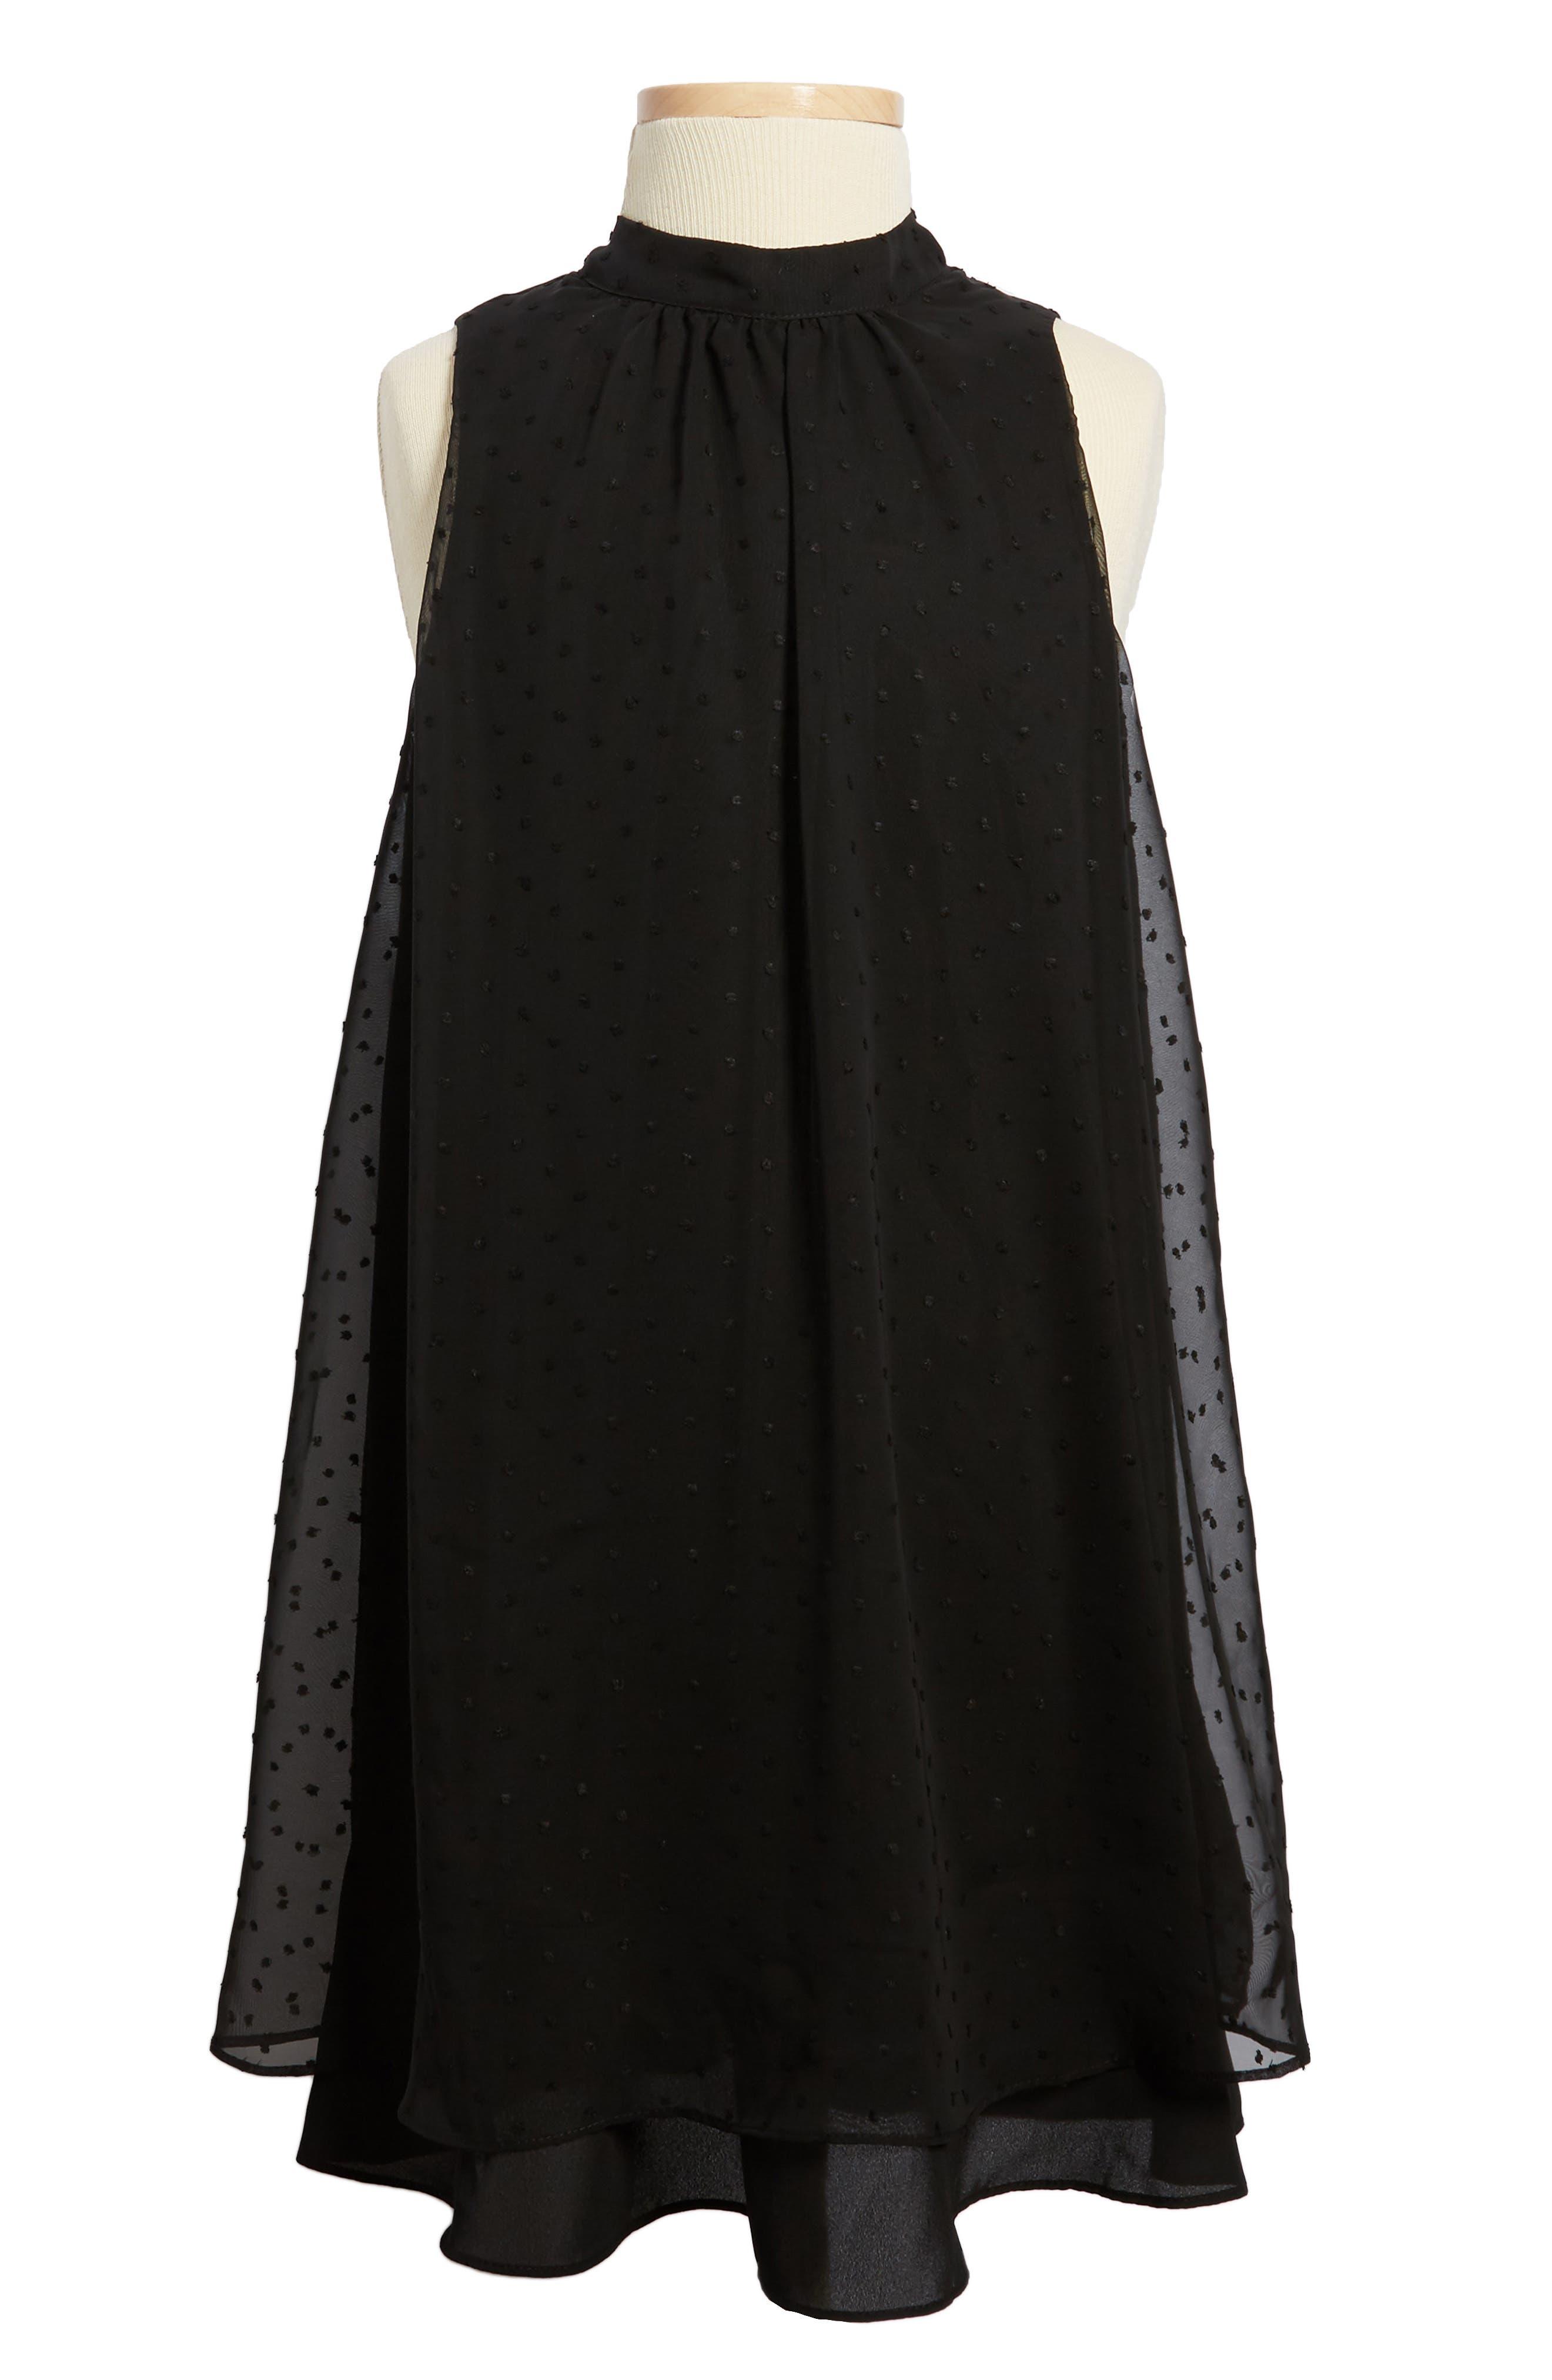 Main Image - Soprano Swiss Dot Swing Dress (Big Girls)